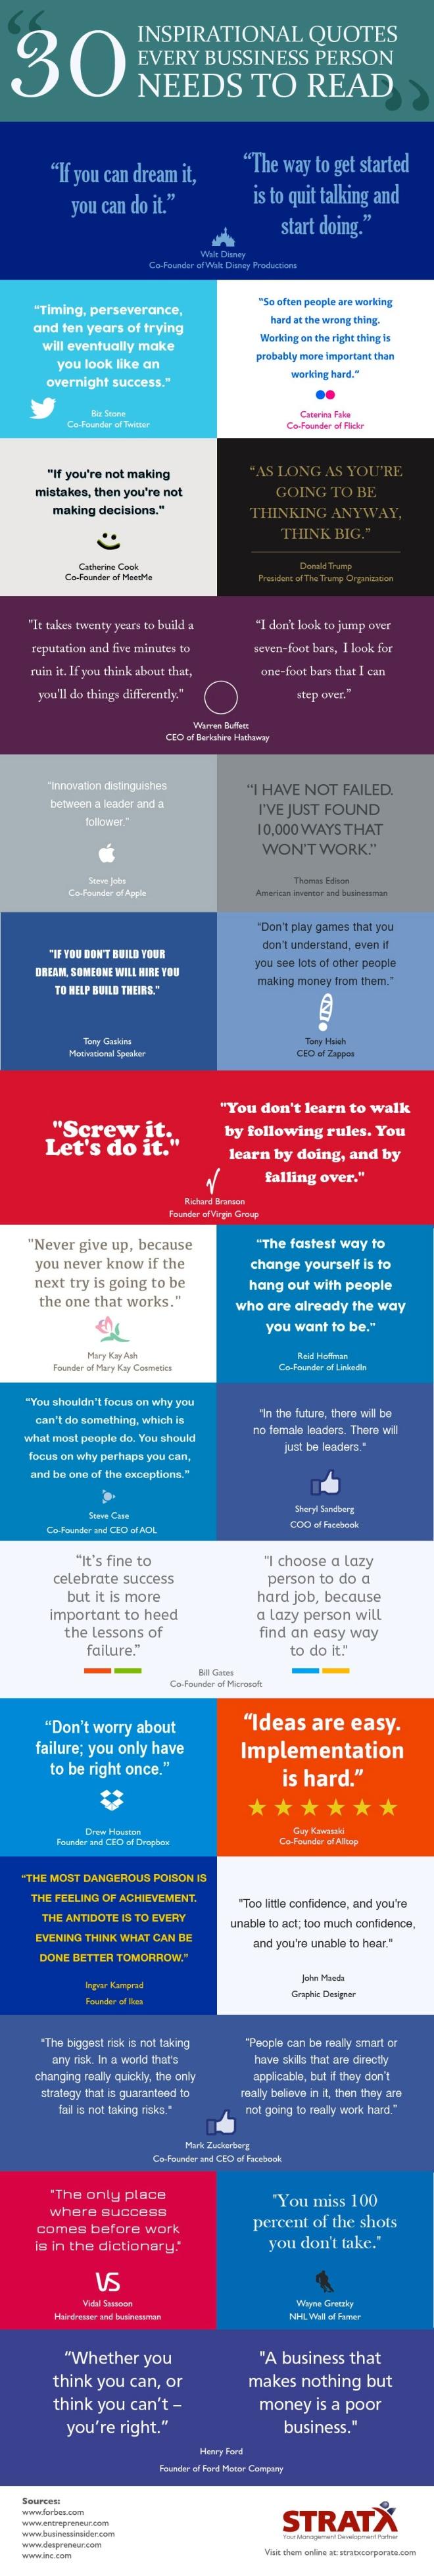 30 citas inspiradoras para emprendedores